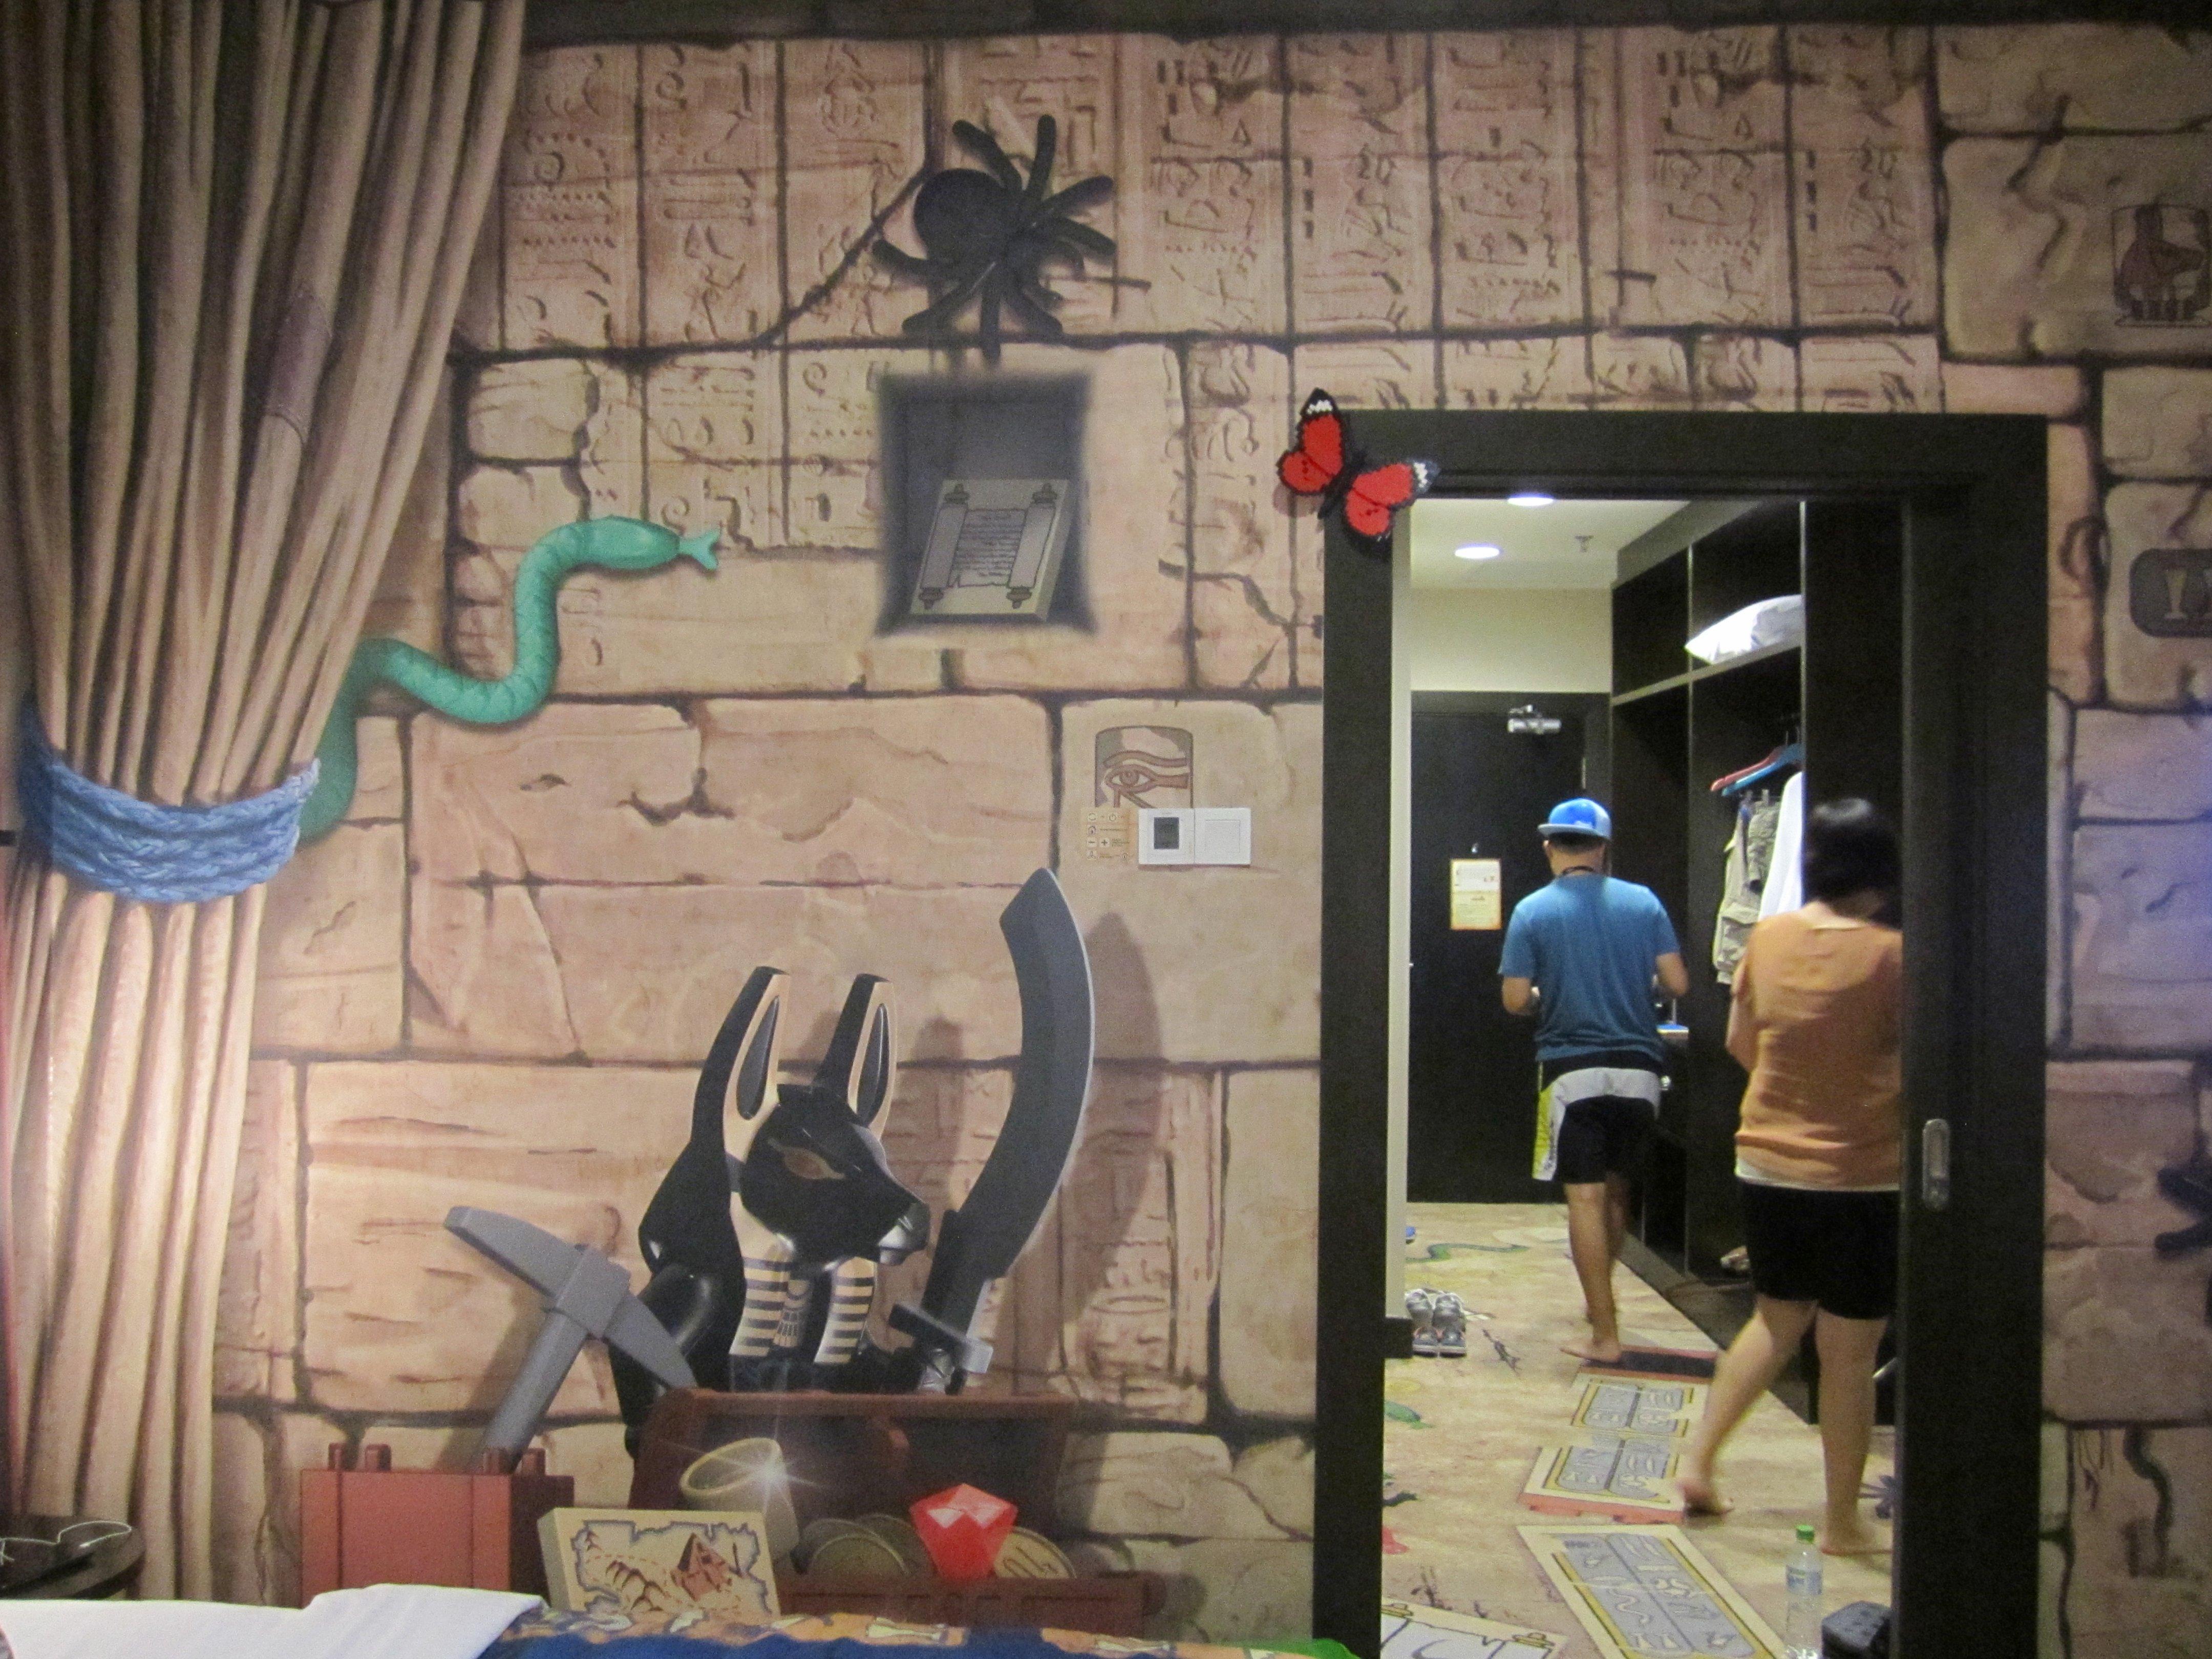 Review legoland malaysia hotel premium adventure themed for Adventure bedroom ideas